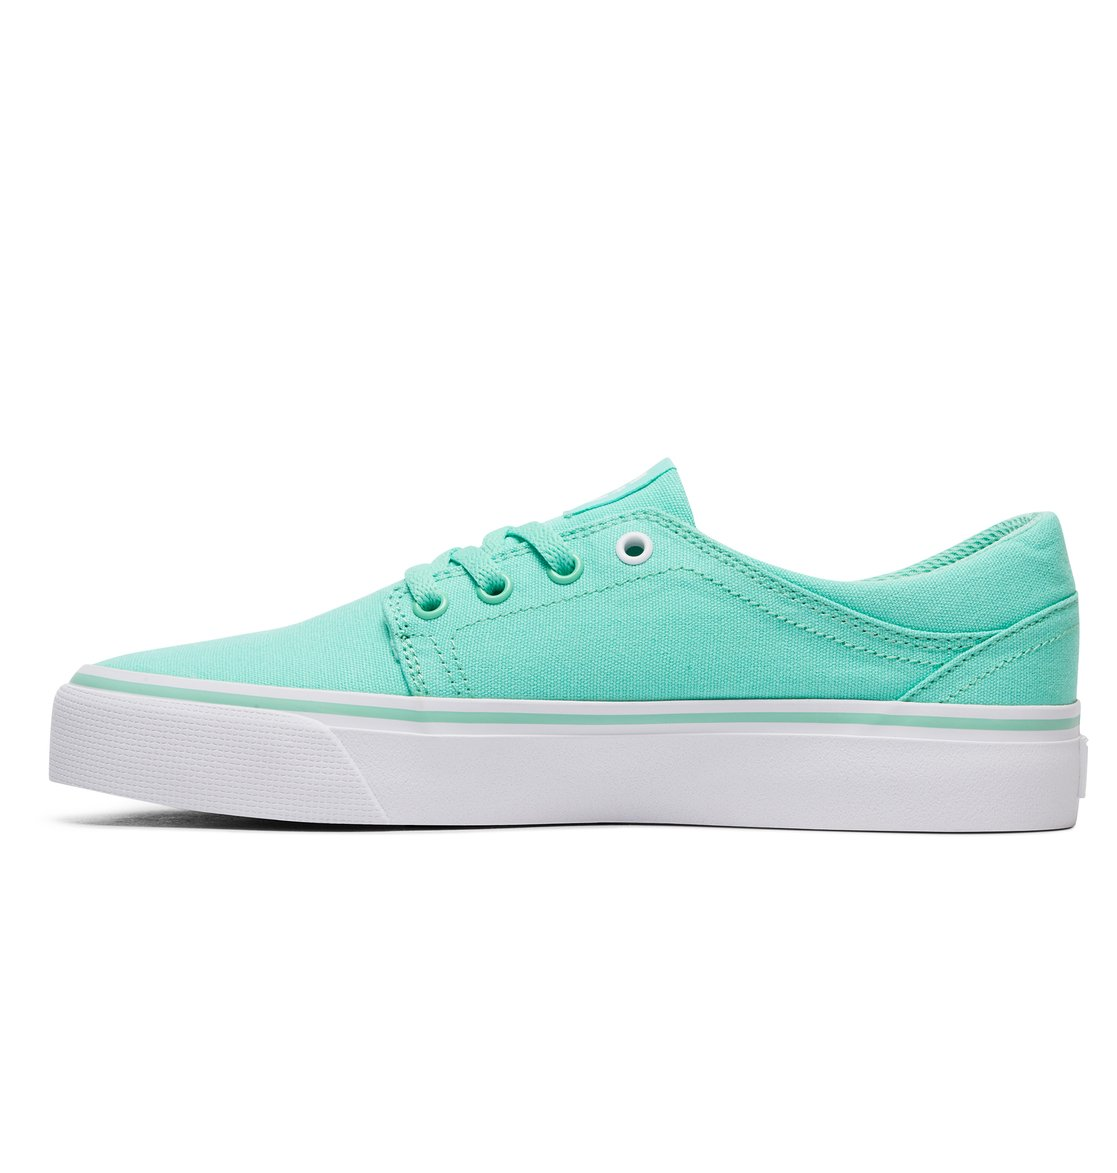 Trase TX - Baskets - Vert - DC Shoes